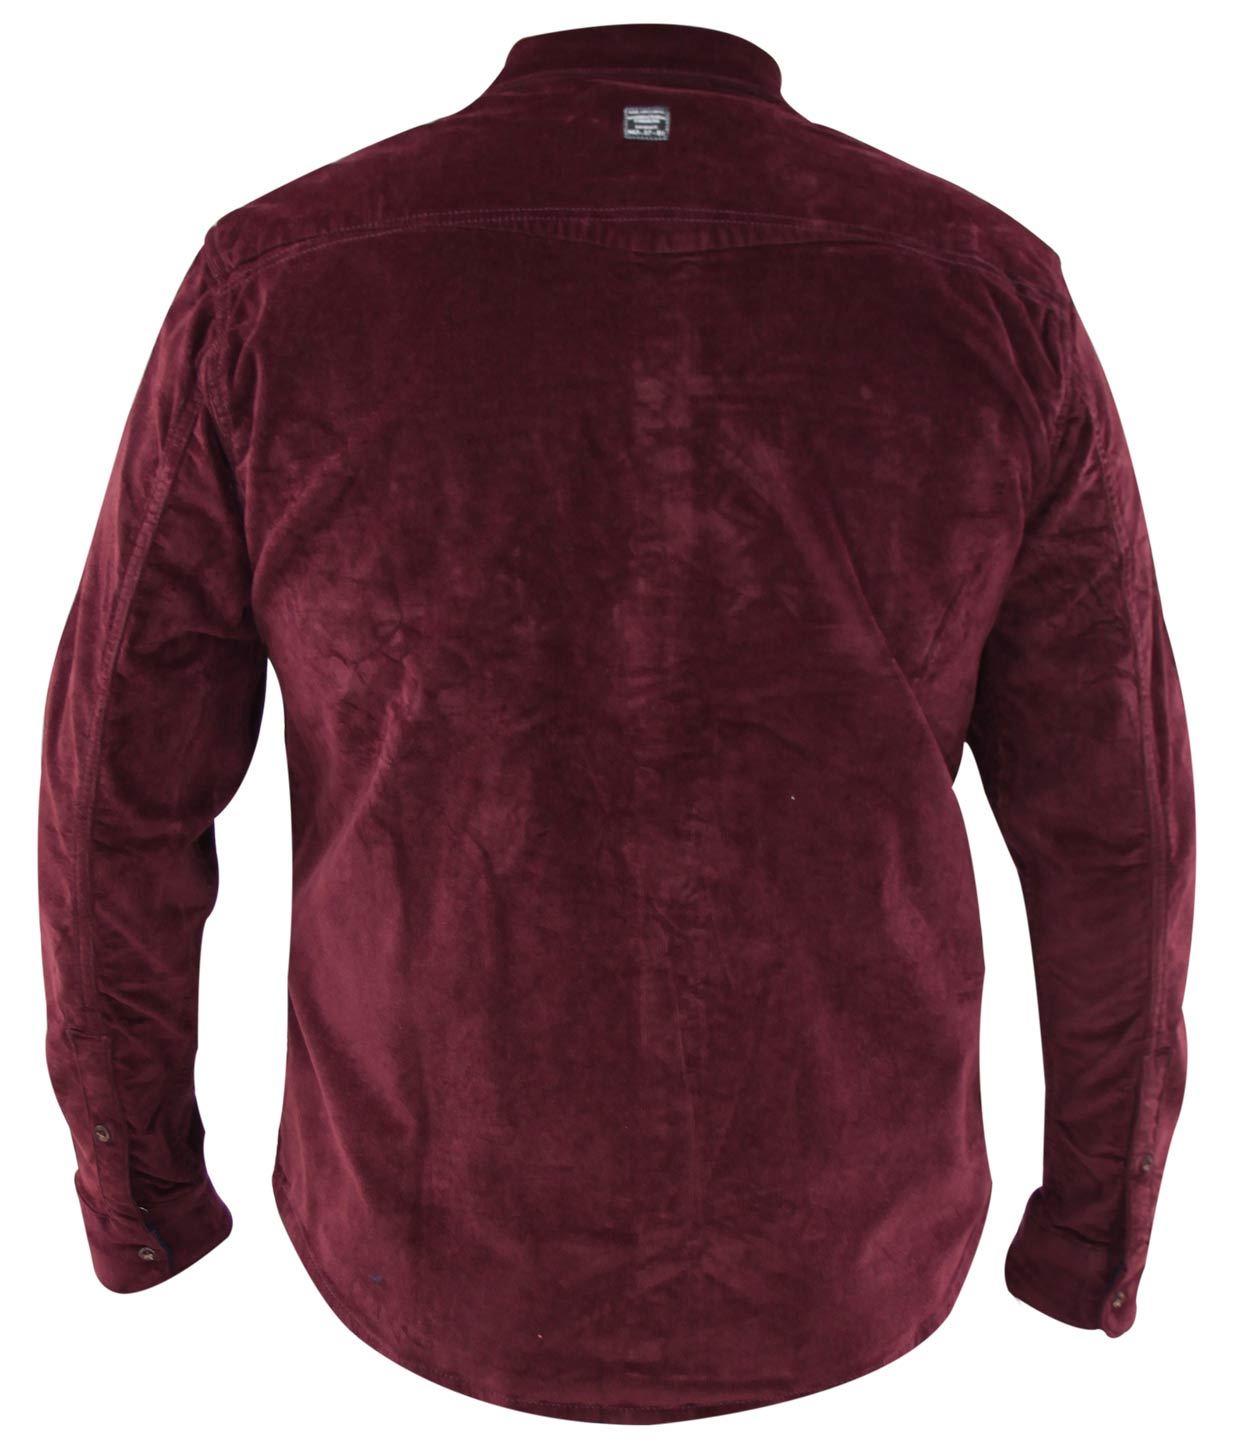 Mens-Corduroy-Cotton-Shirt-Long-Sleeve-Casual-Shirts-Jacksouth-Jacket-Top-S-2XL thumbnail 30